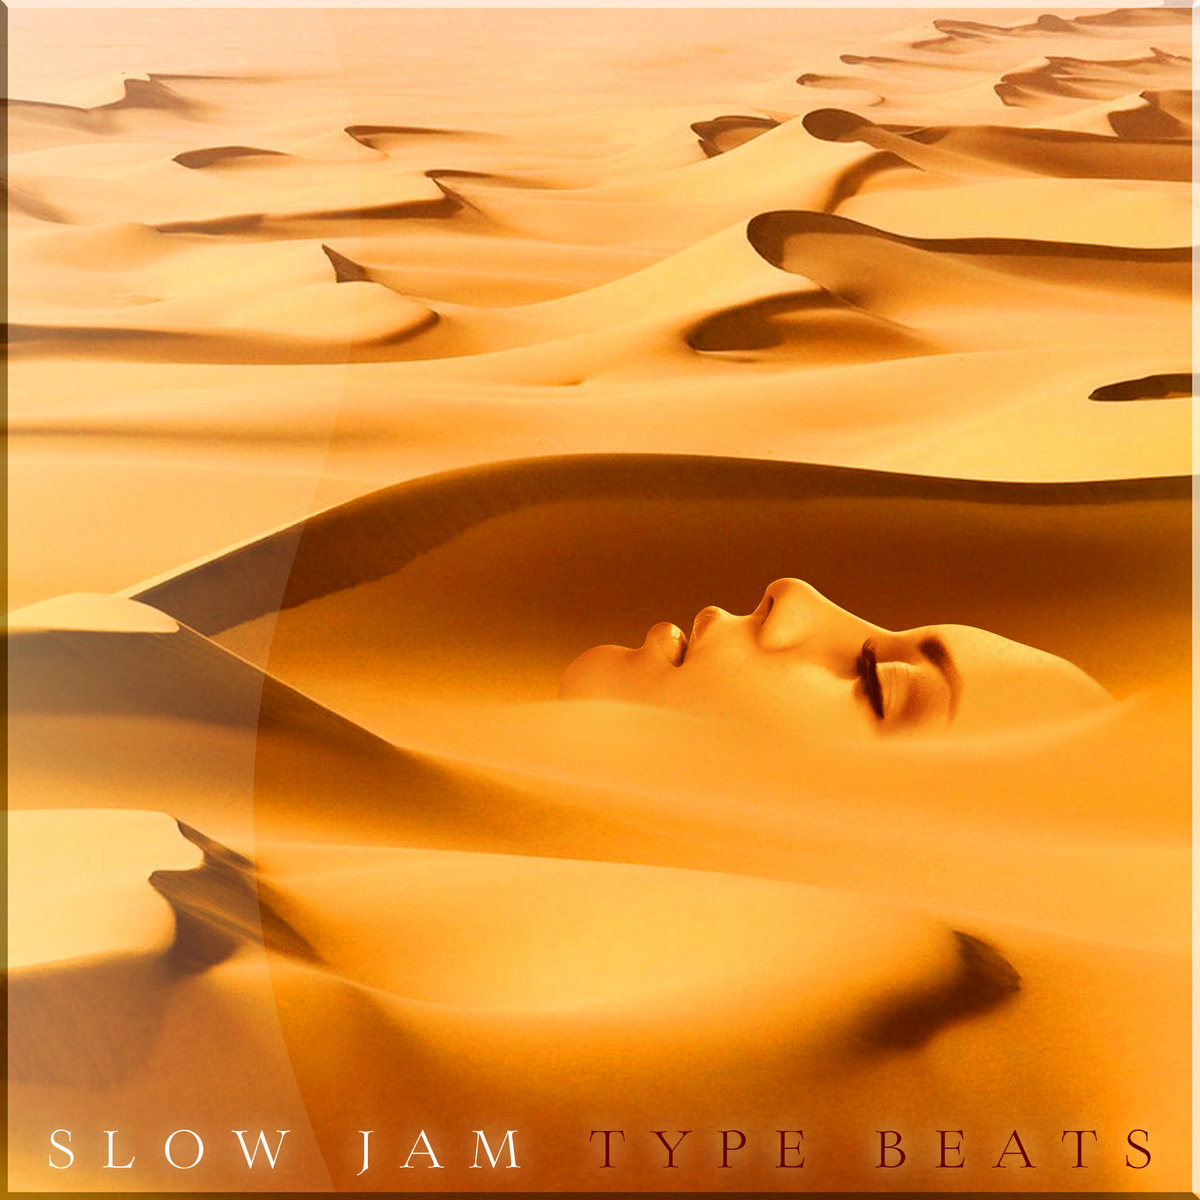 FREE DOWNLOADS •• Slow Jam Type Beats (Tagged Files) | Fasol Prod